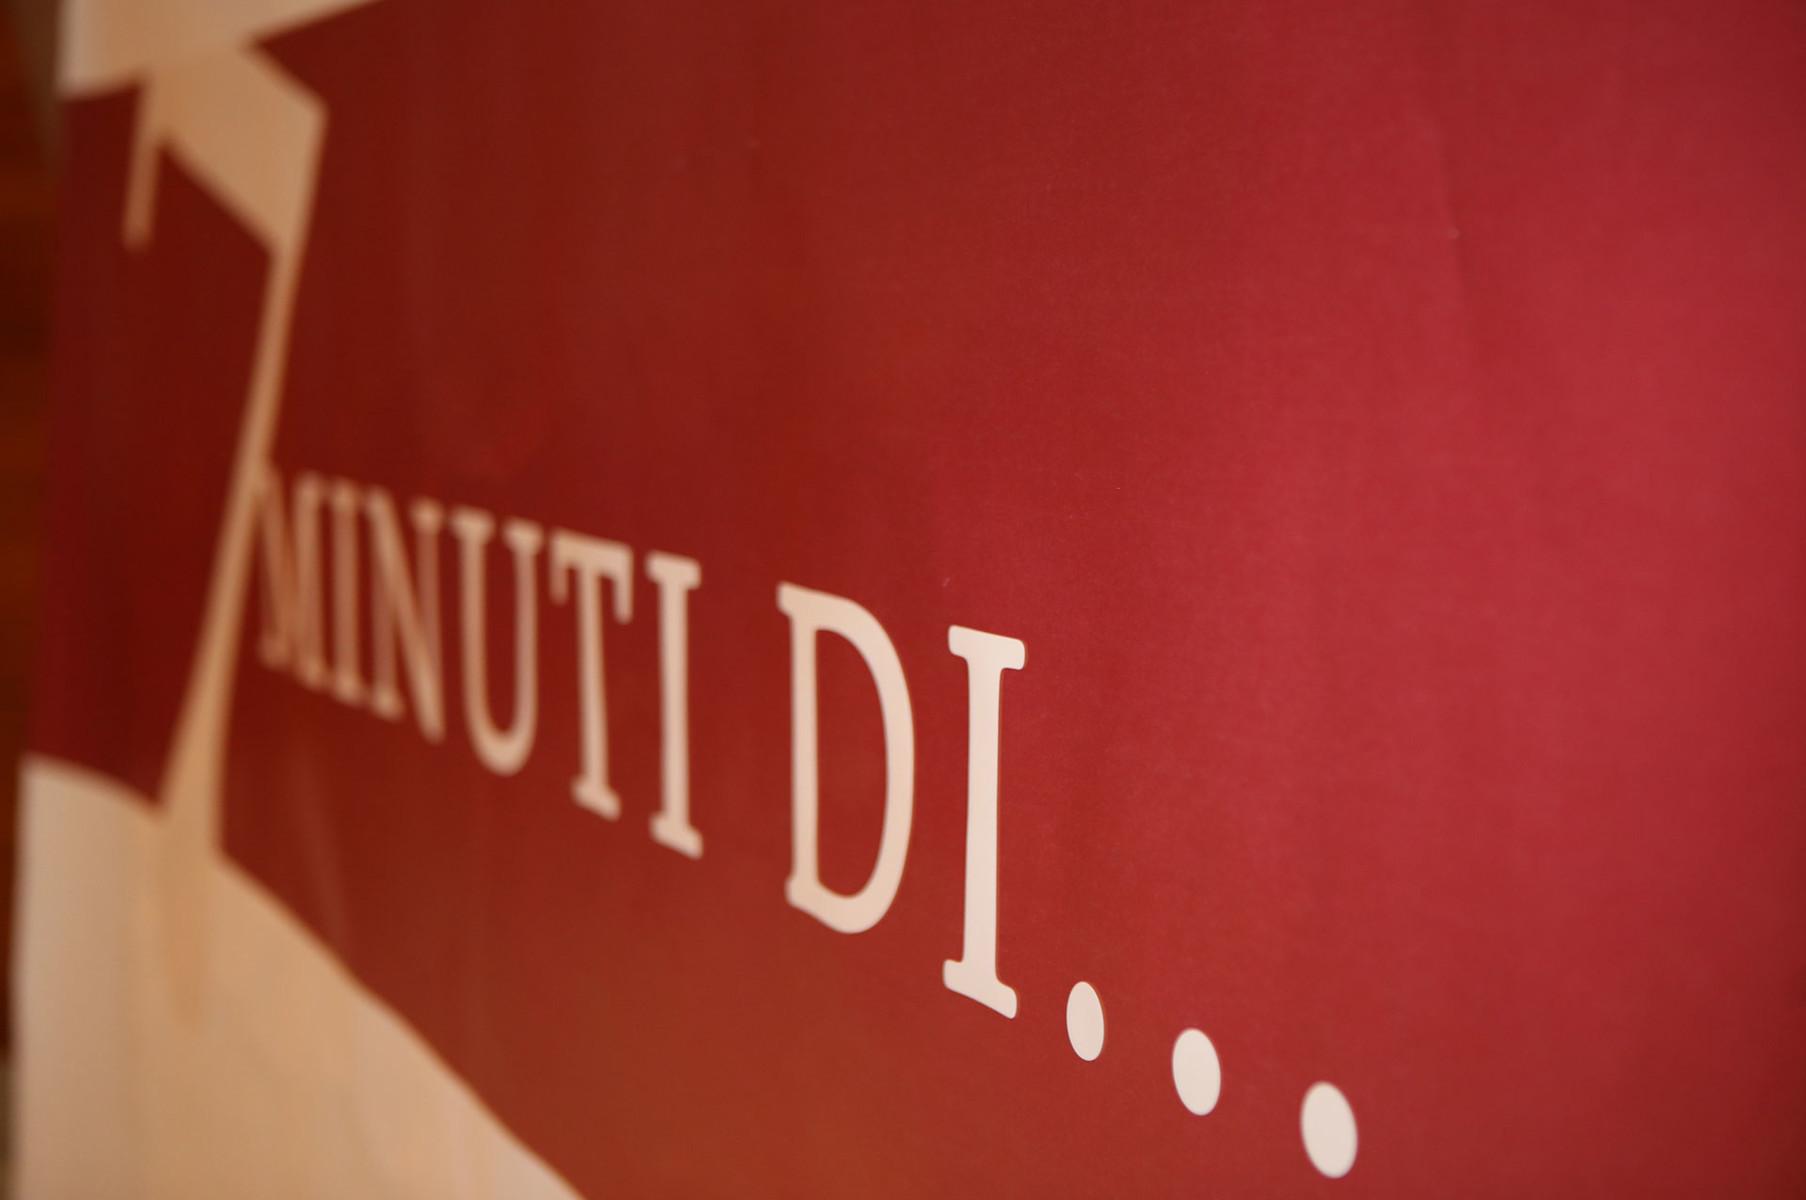 7 Minuti di, Evento 1000Miglia Provincia di Cuneo